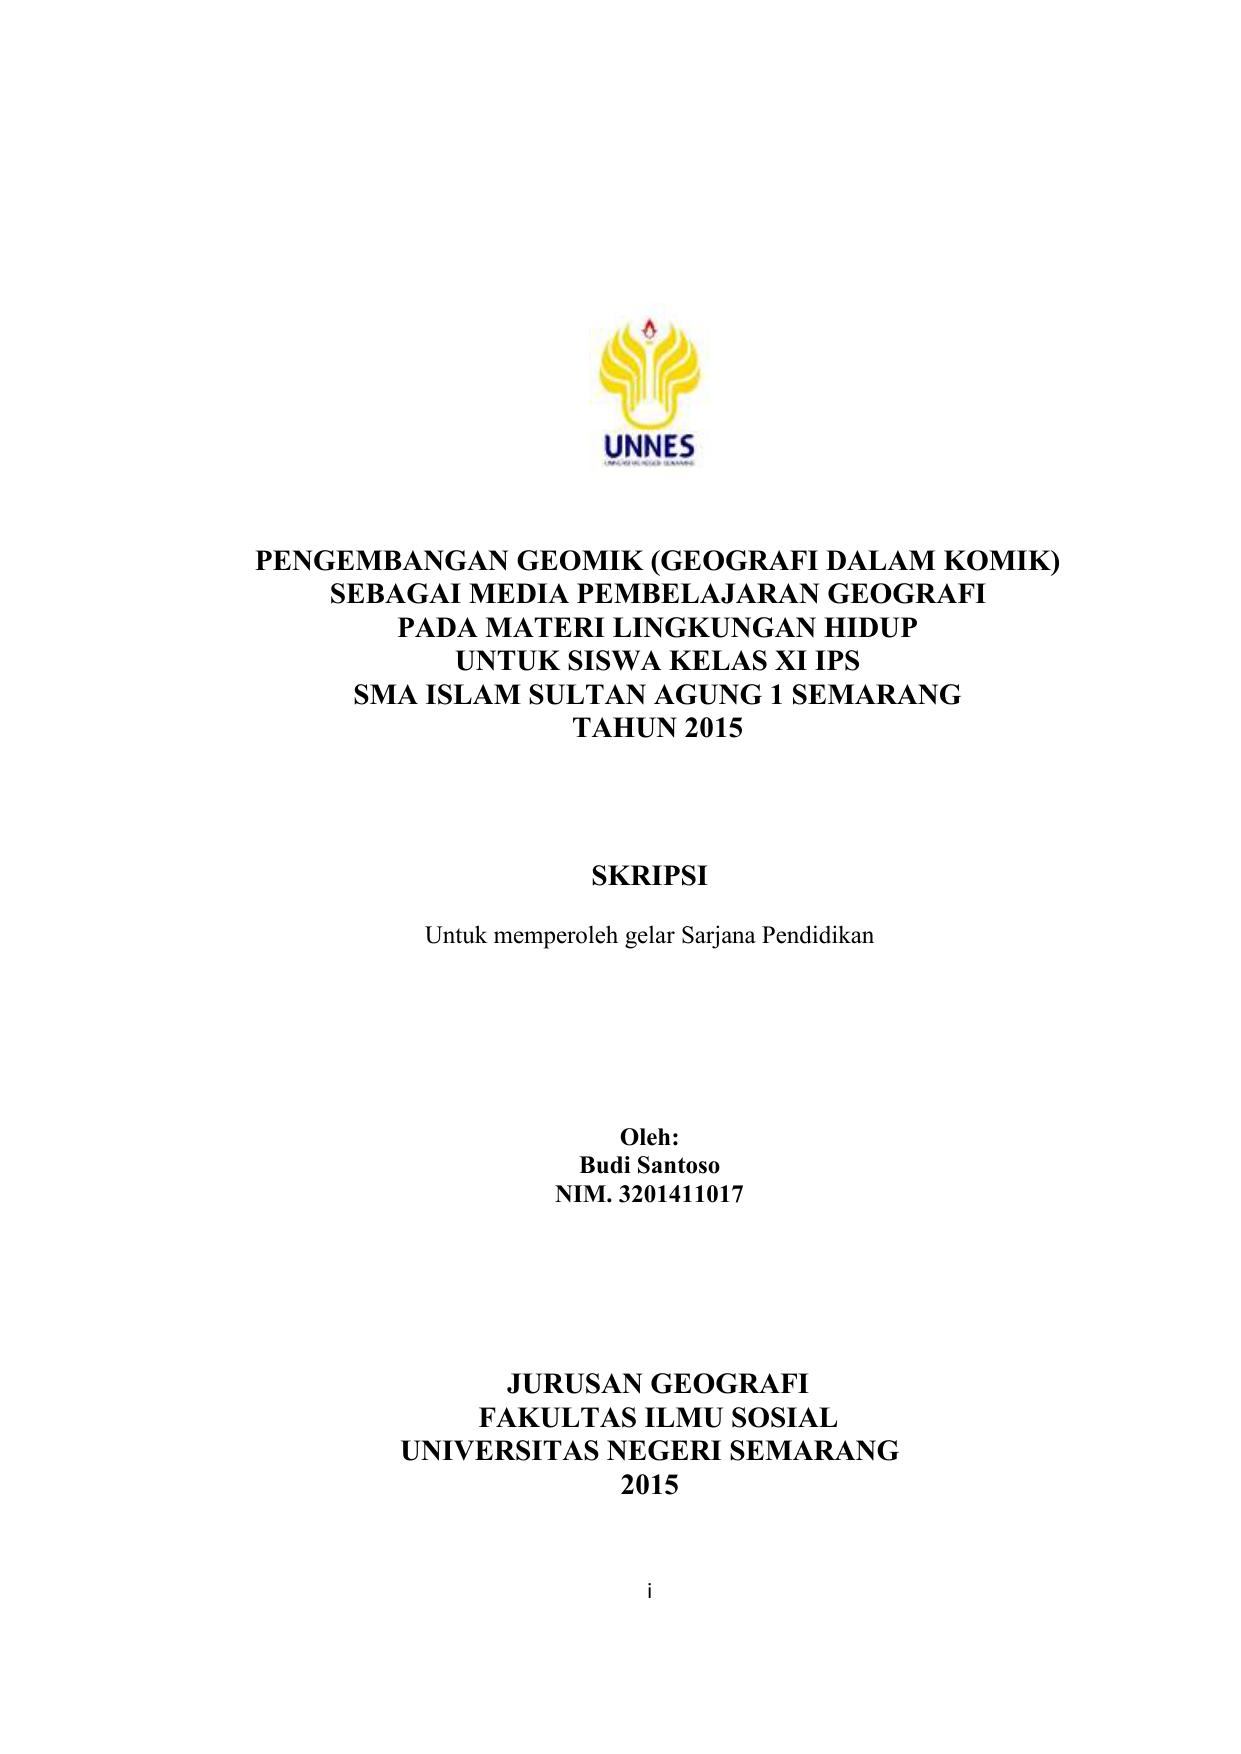 Skripsi Jurusan Geografi Fakultas Ilmu Sosial Universitas